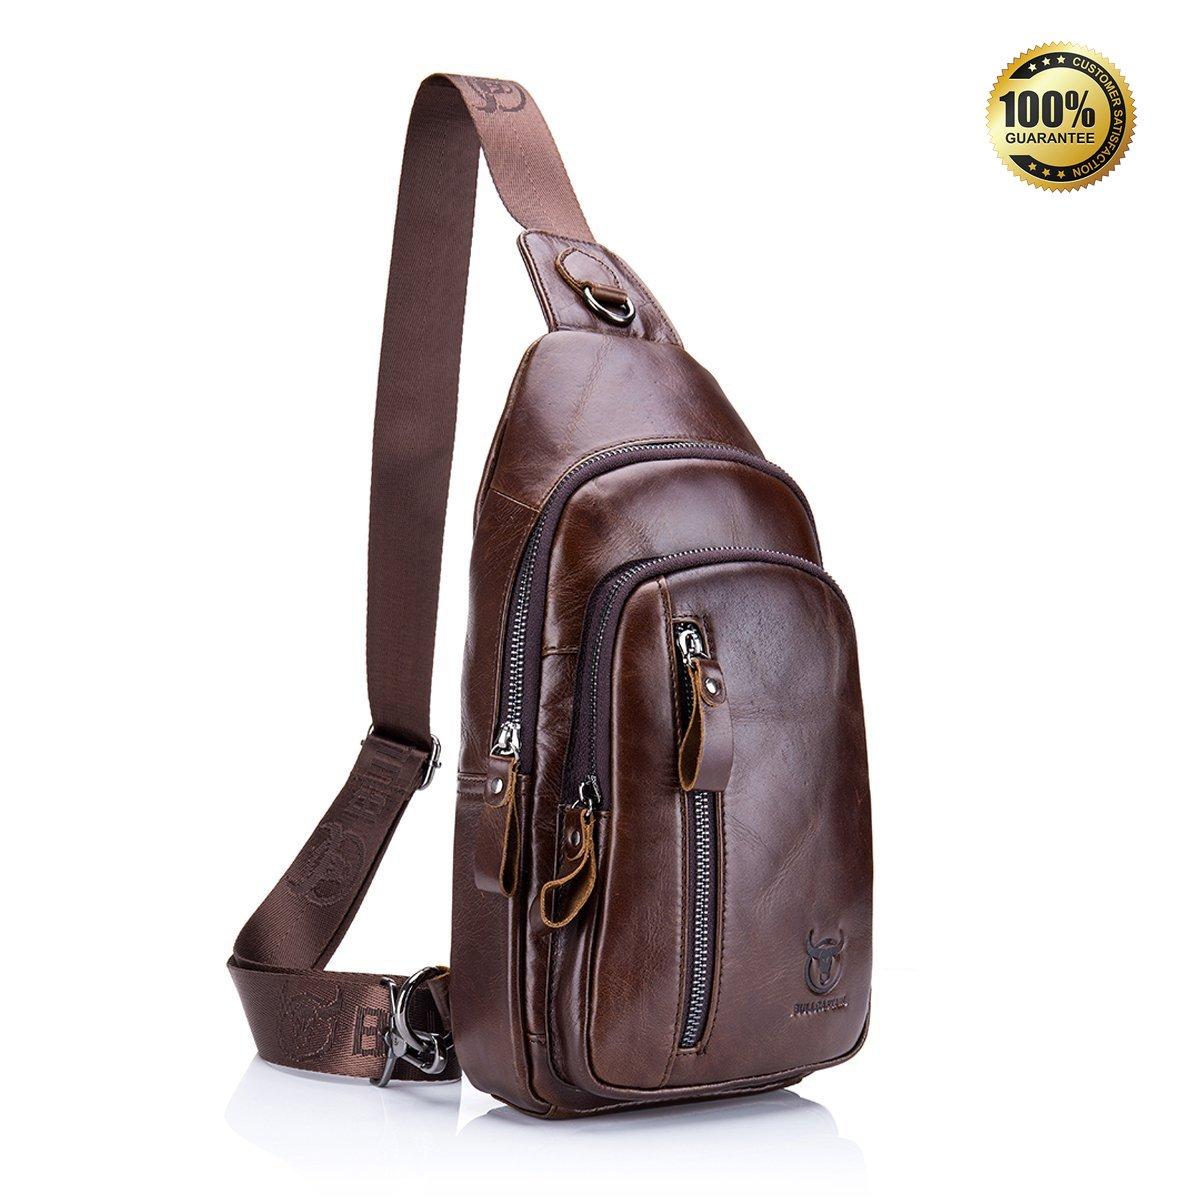 Black Genuine Leather Sling Bag,Full Grain Leather Casual Crossbody Shoulder Chest Bag Travel Hiking Vintage Day Pack Backpacks for Men